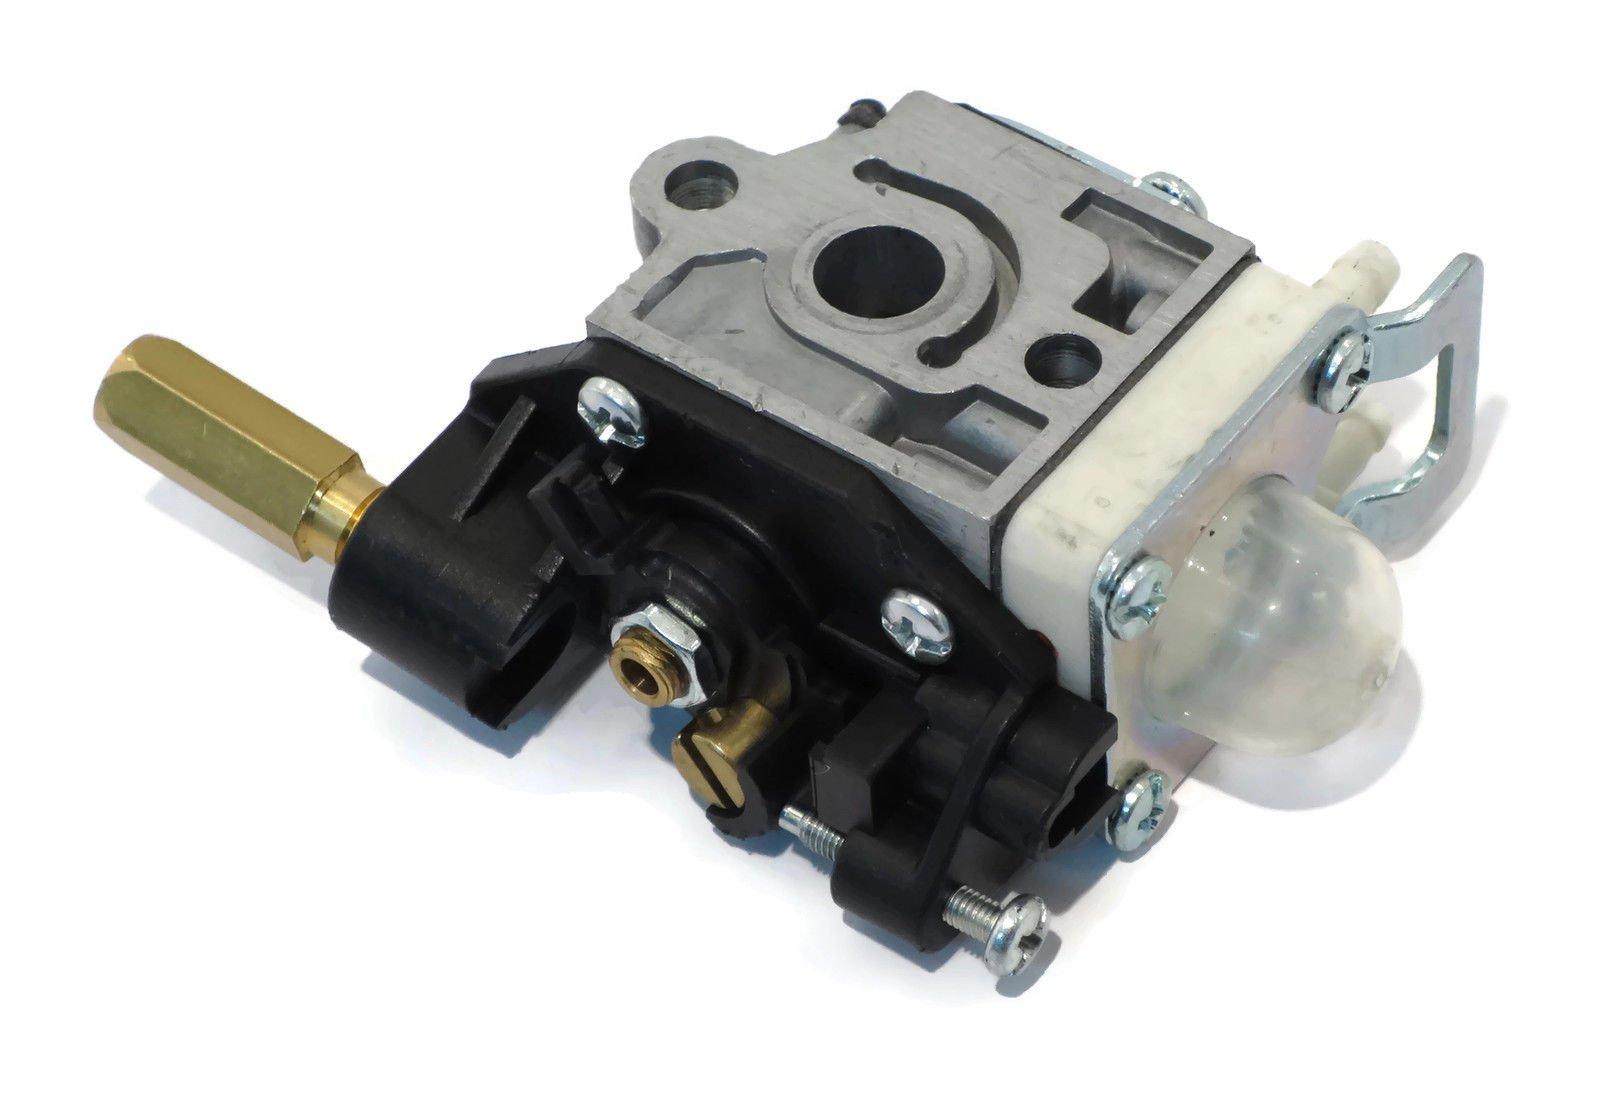 The ROP Shop Carburetor Carb fits Echo PE200 PE201 PPF210 PPF211 Lawn Edger Pole Saw Pruners by The ROP Shop